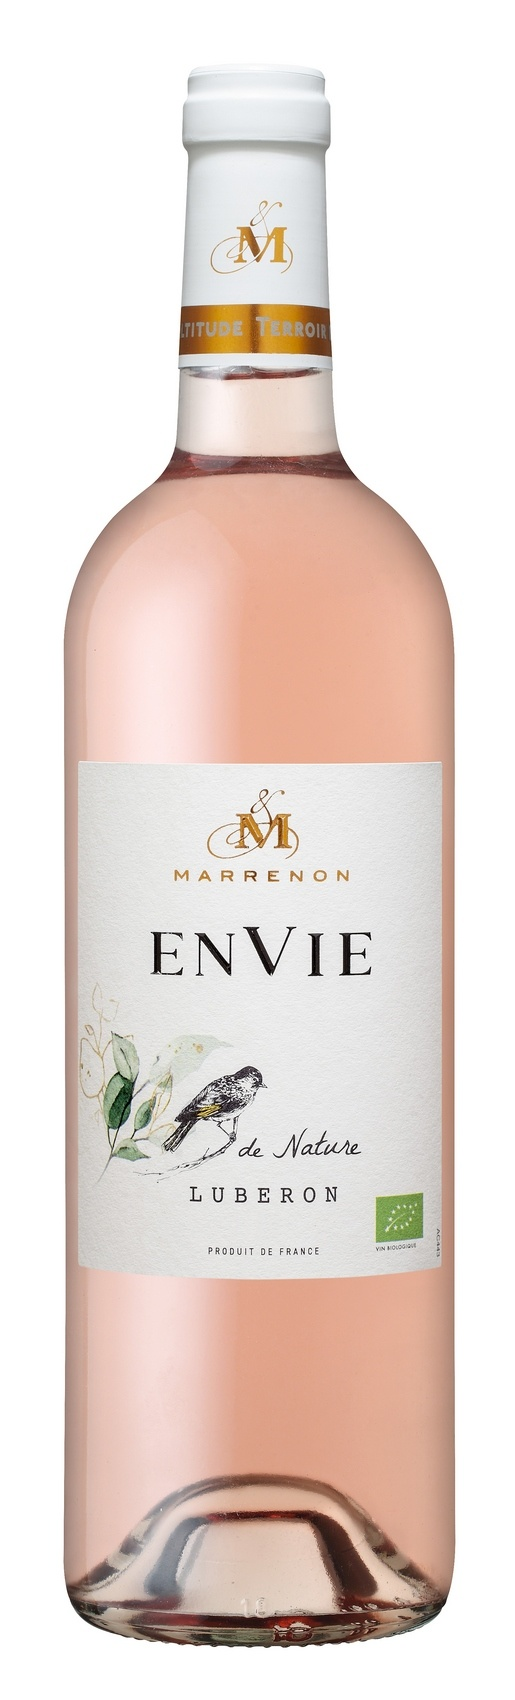 Marrenon Envie de Nature Bio Rosé, 2020, Luberon, Frankrijk, Rosé wijn